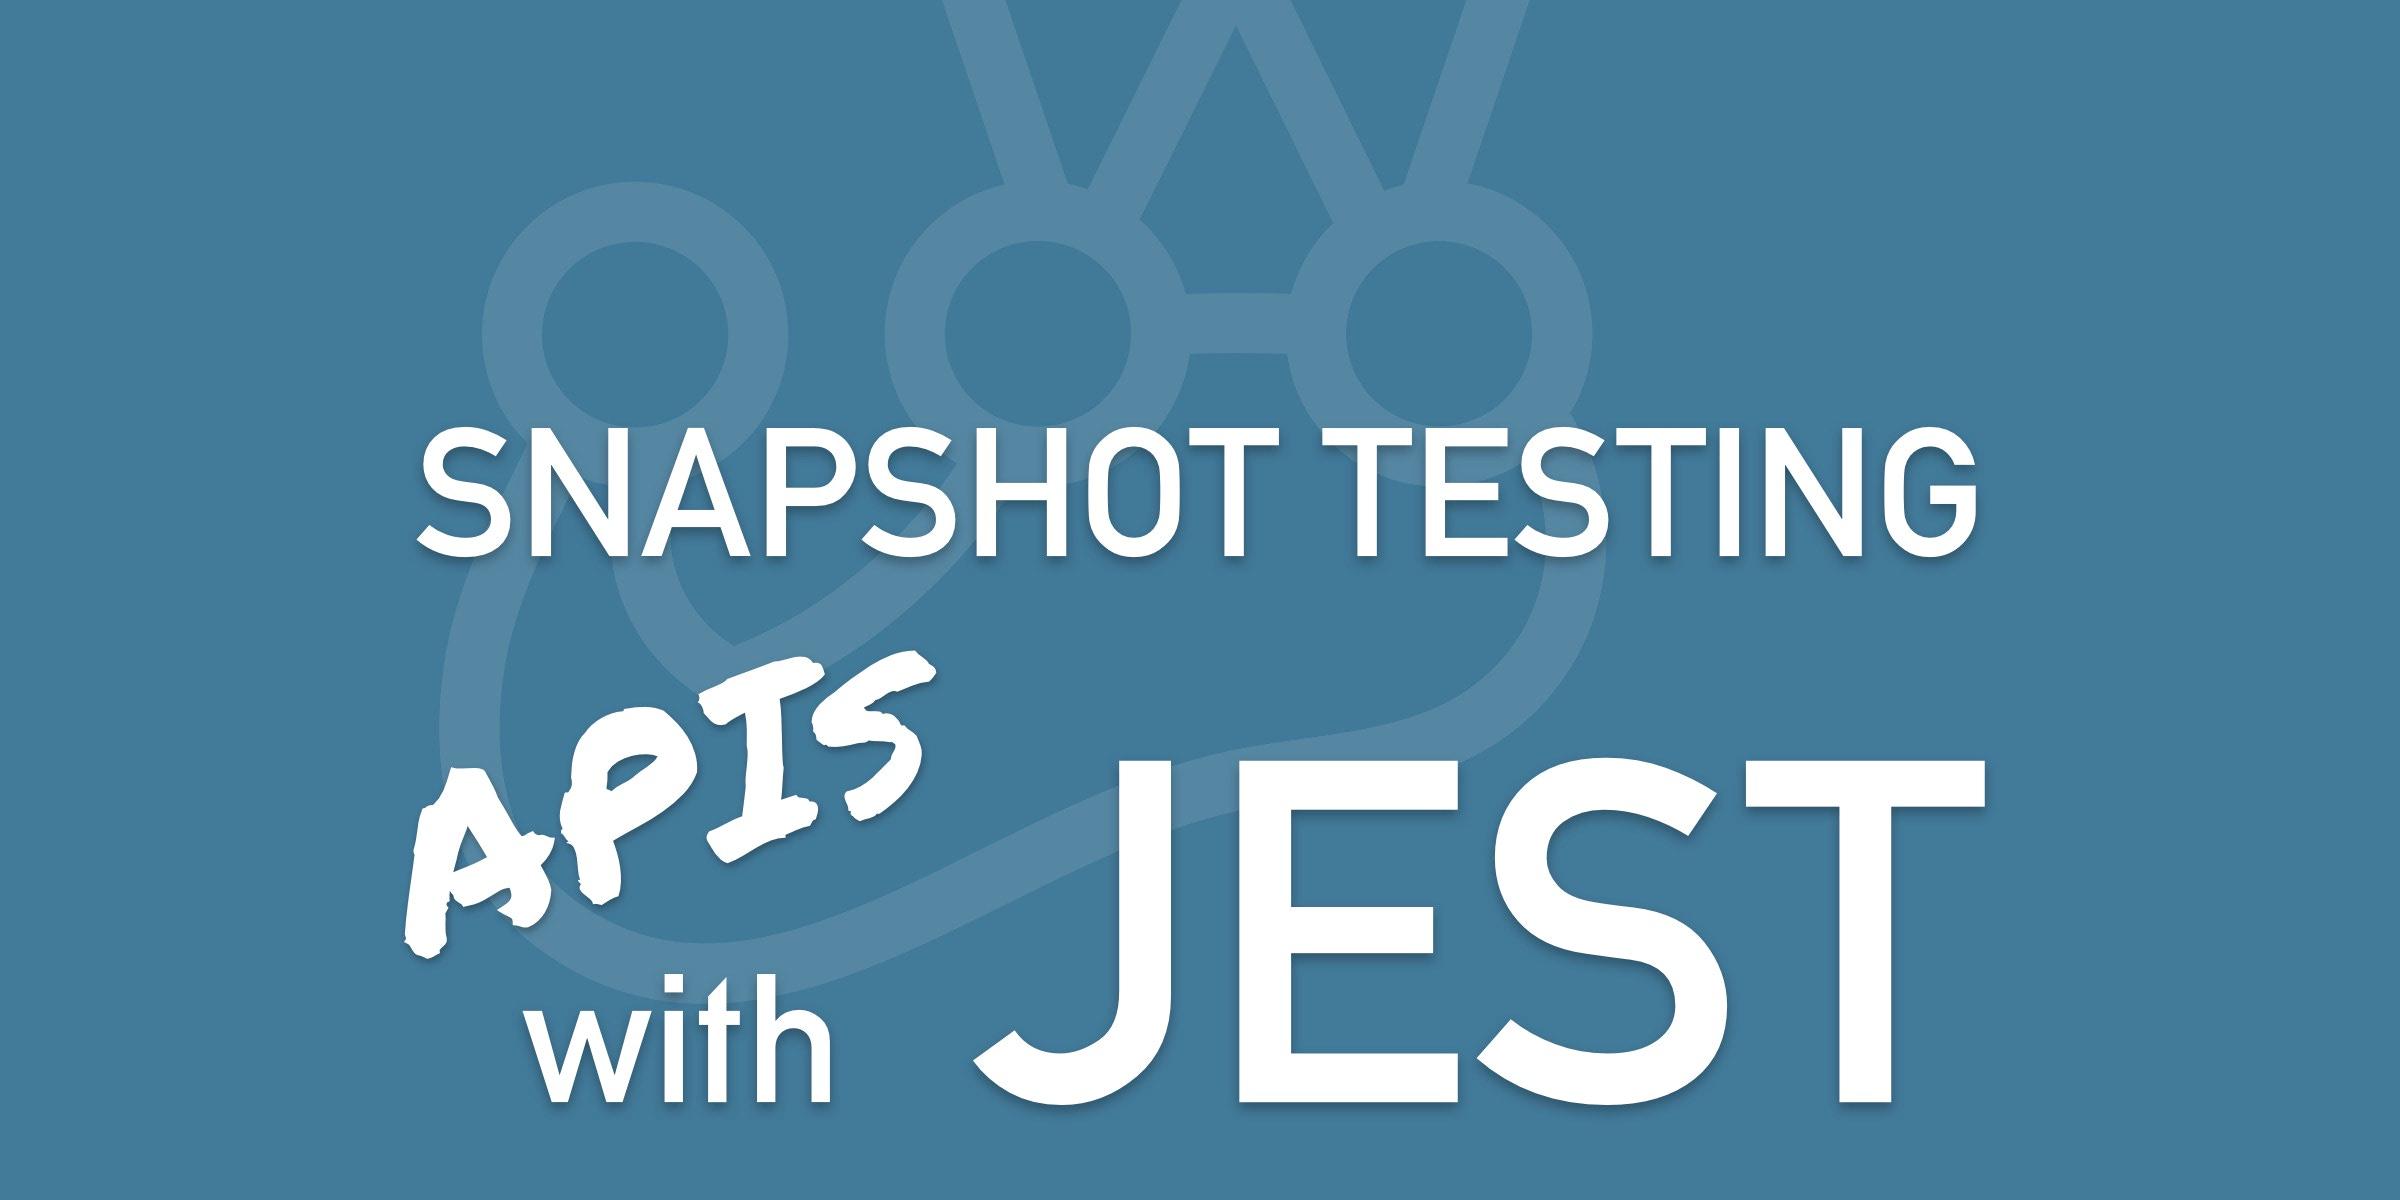 Snapshot Testing APIs with Jest